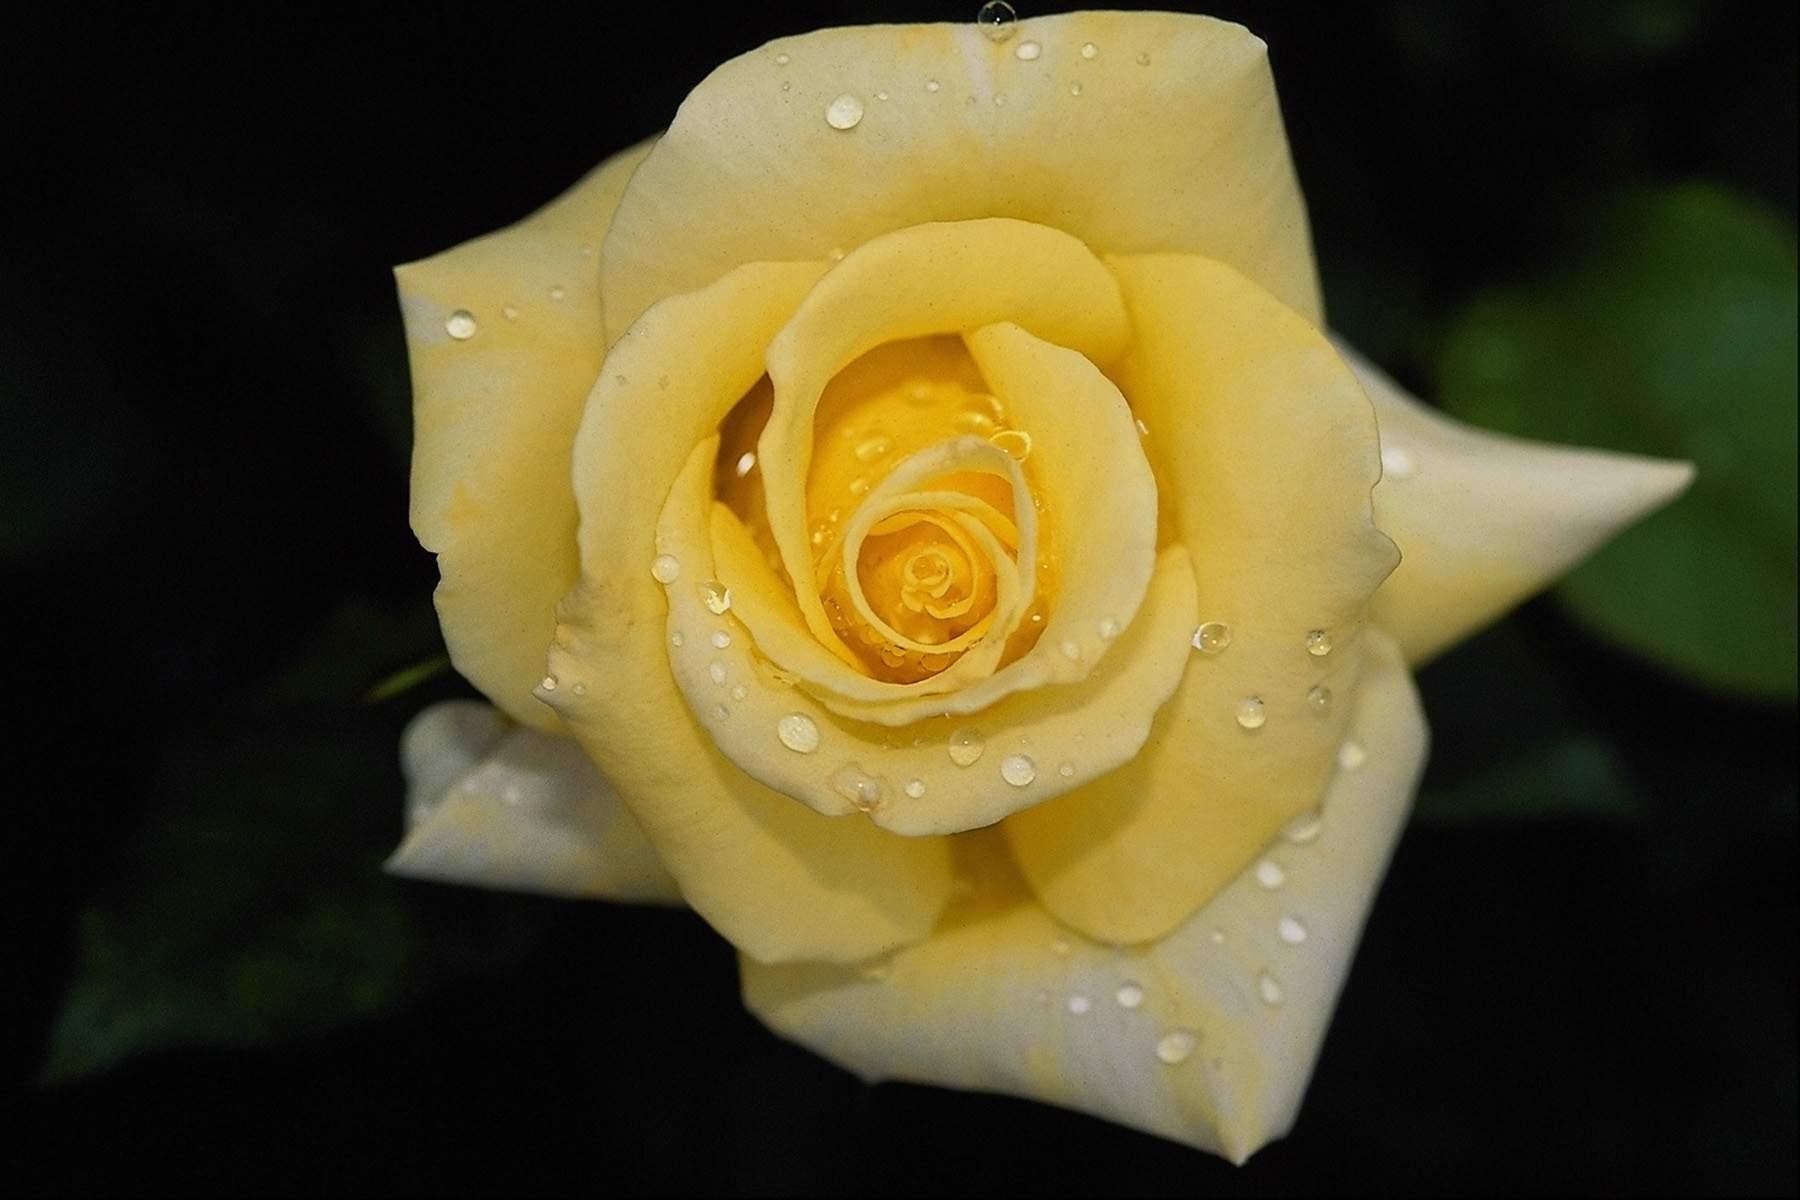 Hd wallpaper yellow rose - Yellow Rose Flowers Wallpapers Hd Pictures 4 Hd Wallpapers